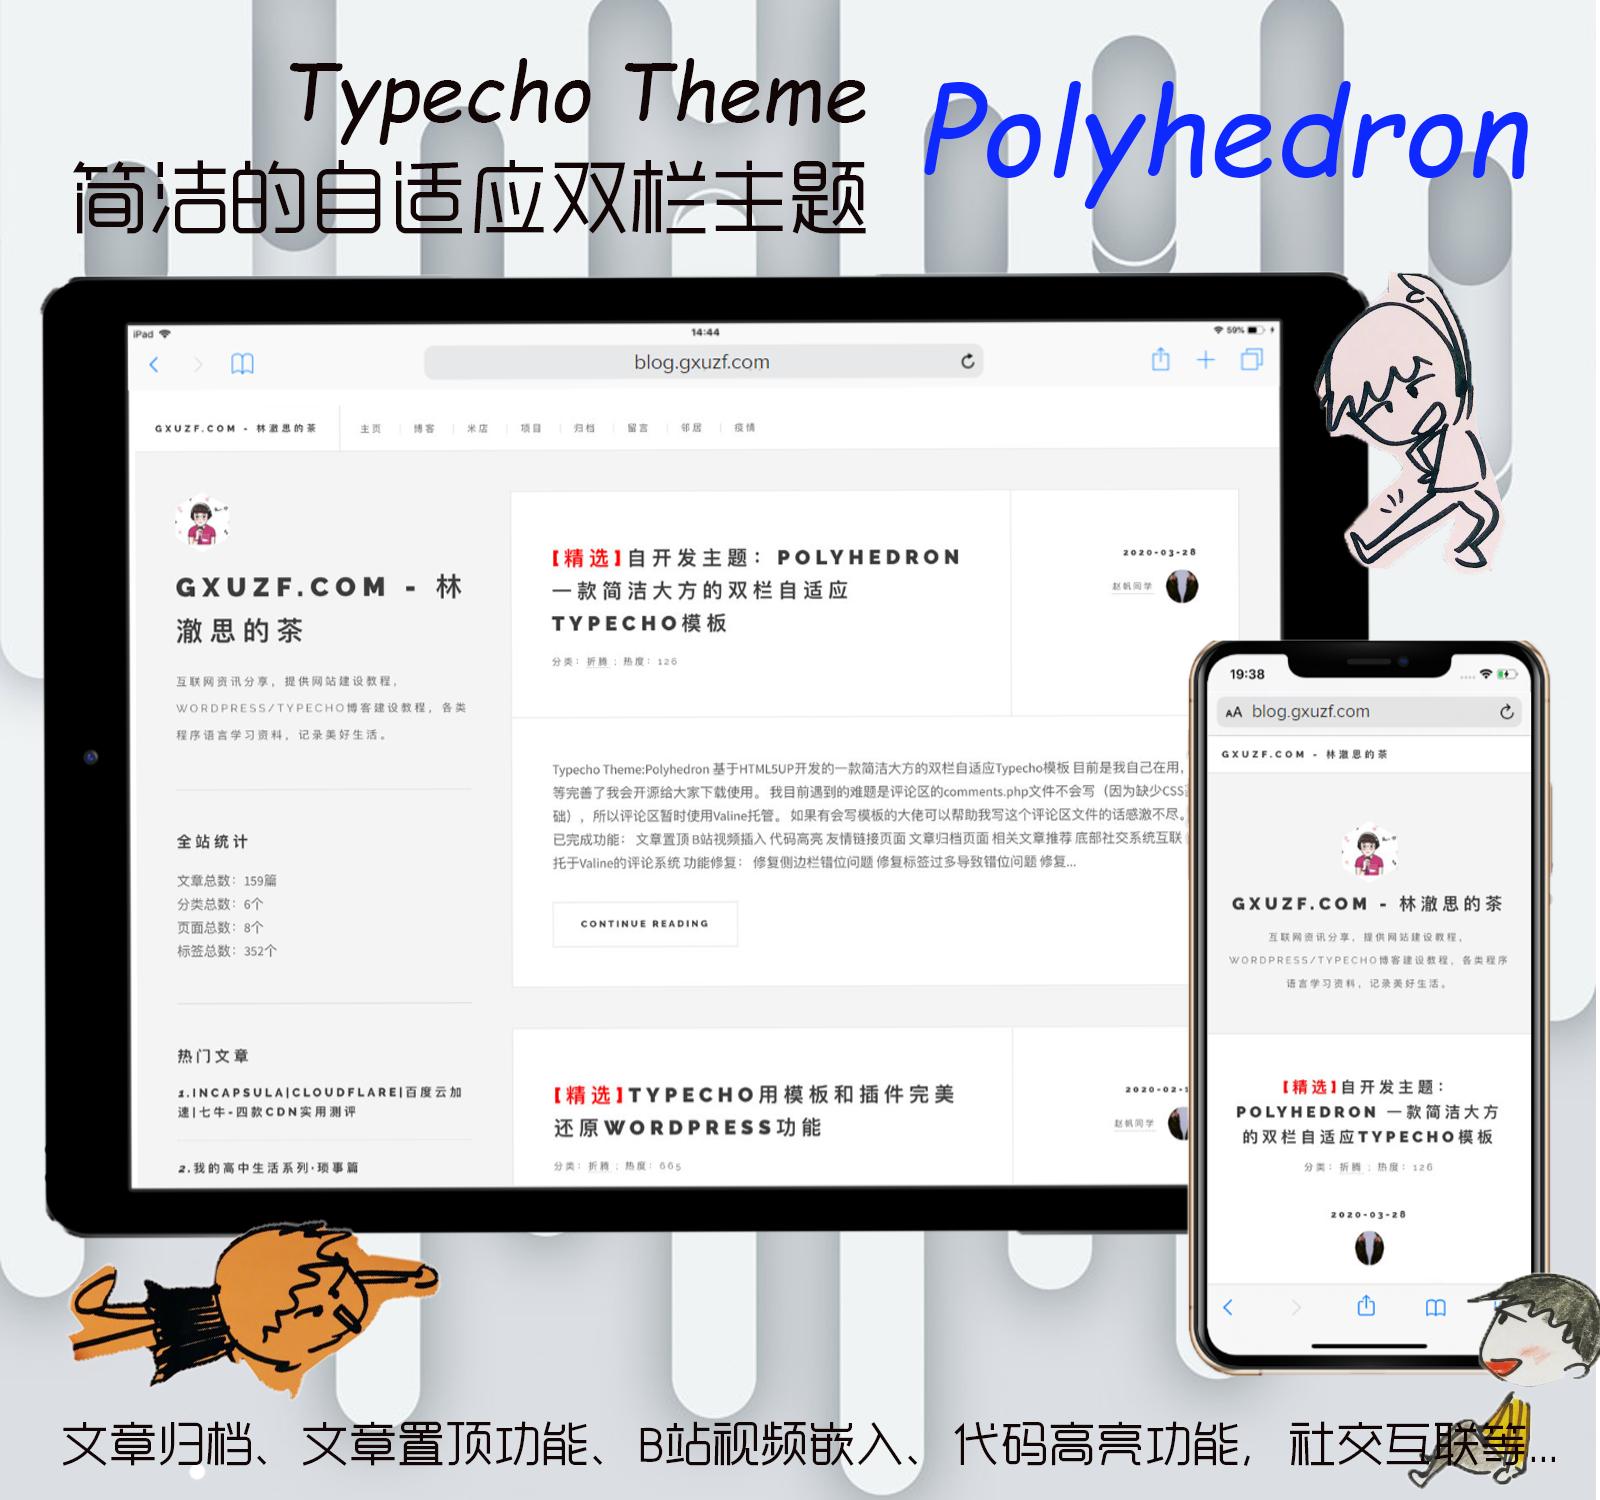 POLYHEDRON主题:一款简洁大方的双栏自适应TYPECHO主题